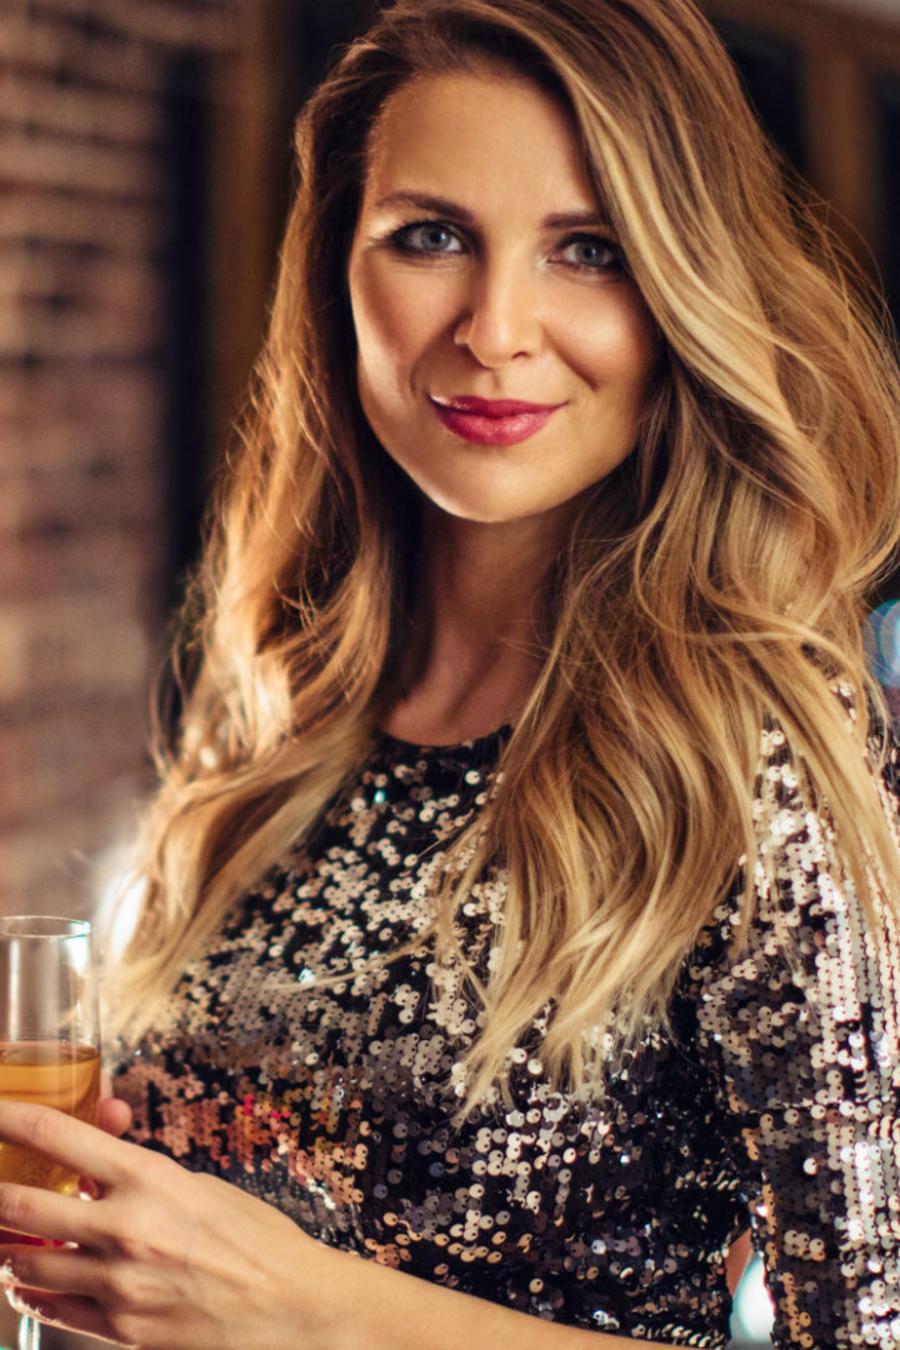 Mujer sosteniendo una copa de vino